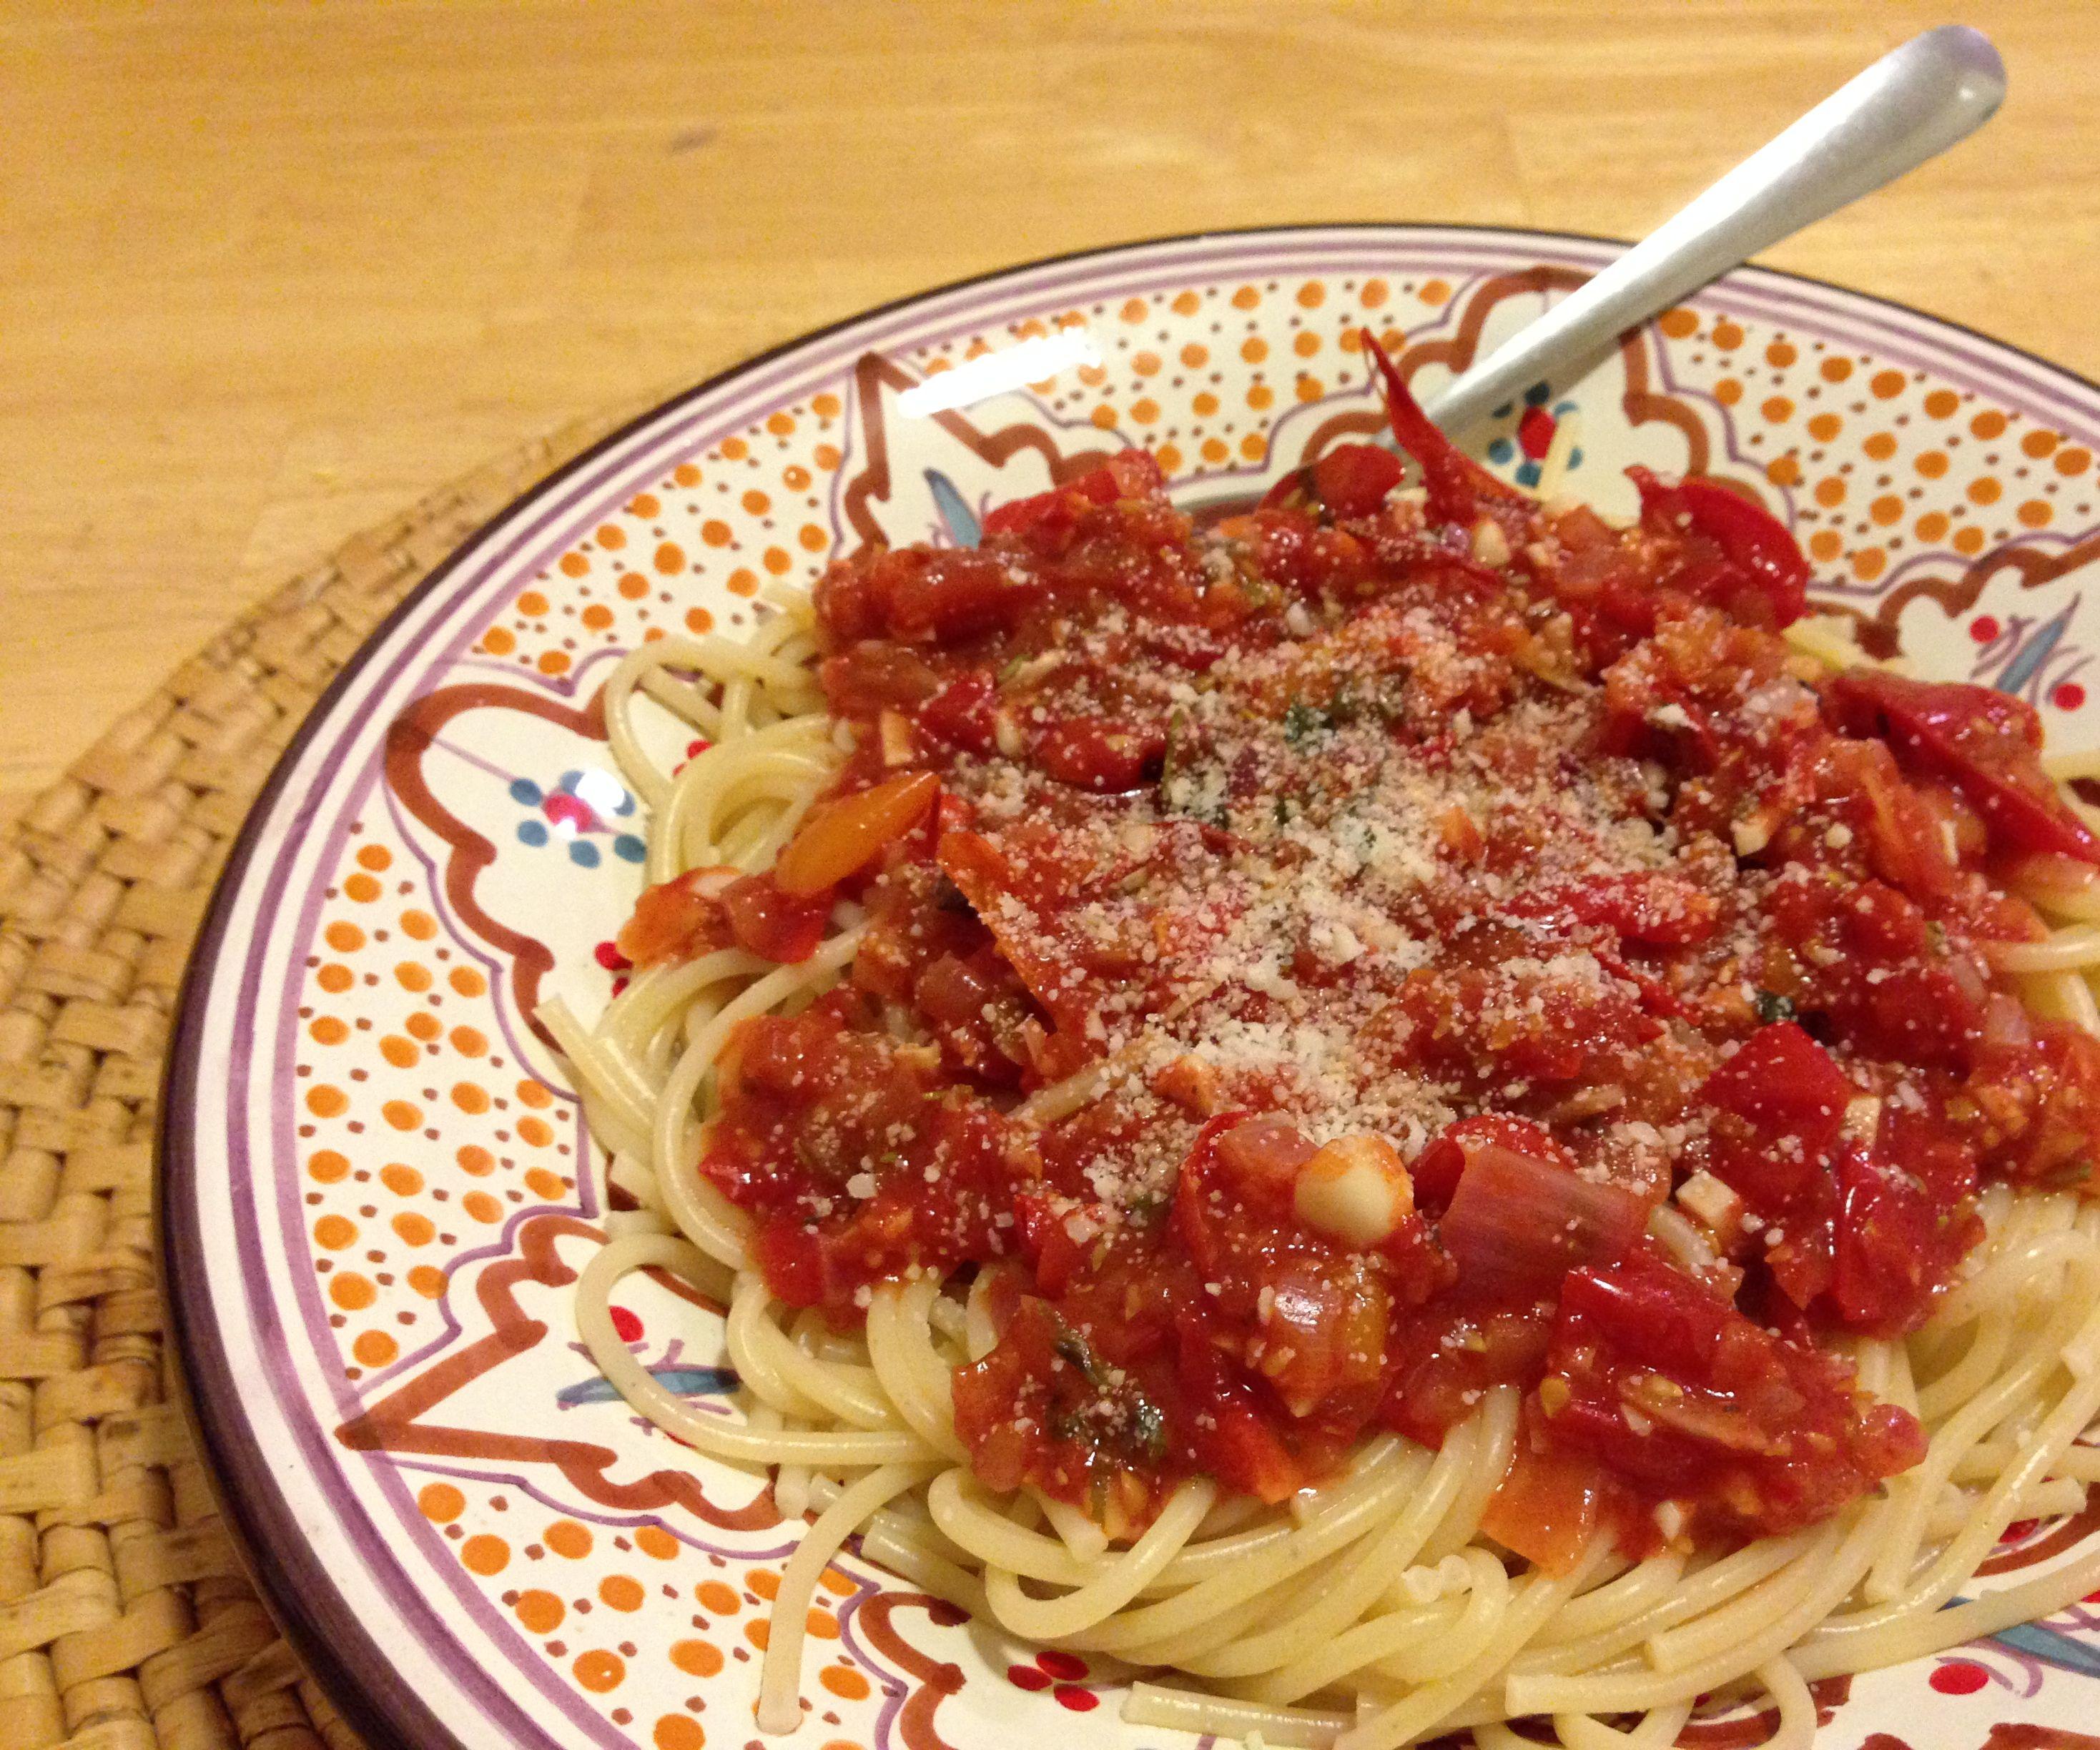 Don't-Let-the-Tomatoes-Go-Bad Marinara Sauce